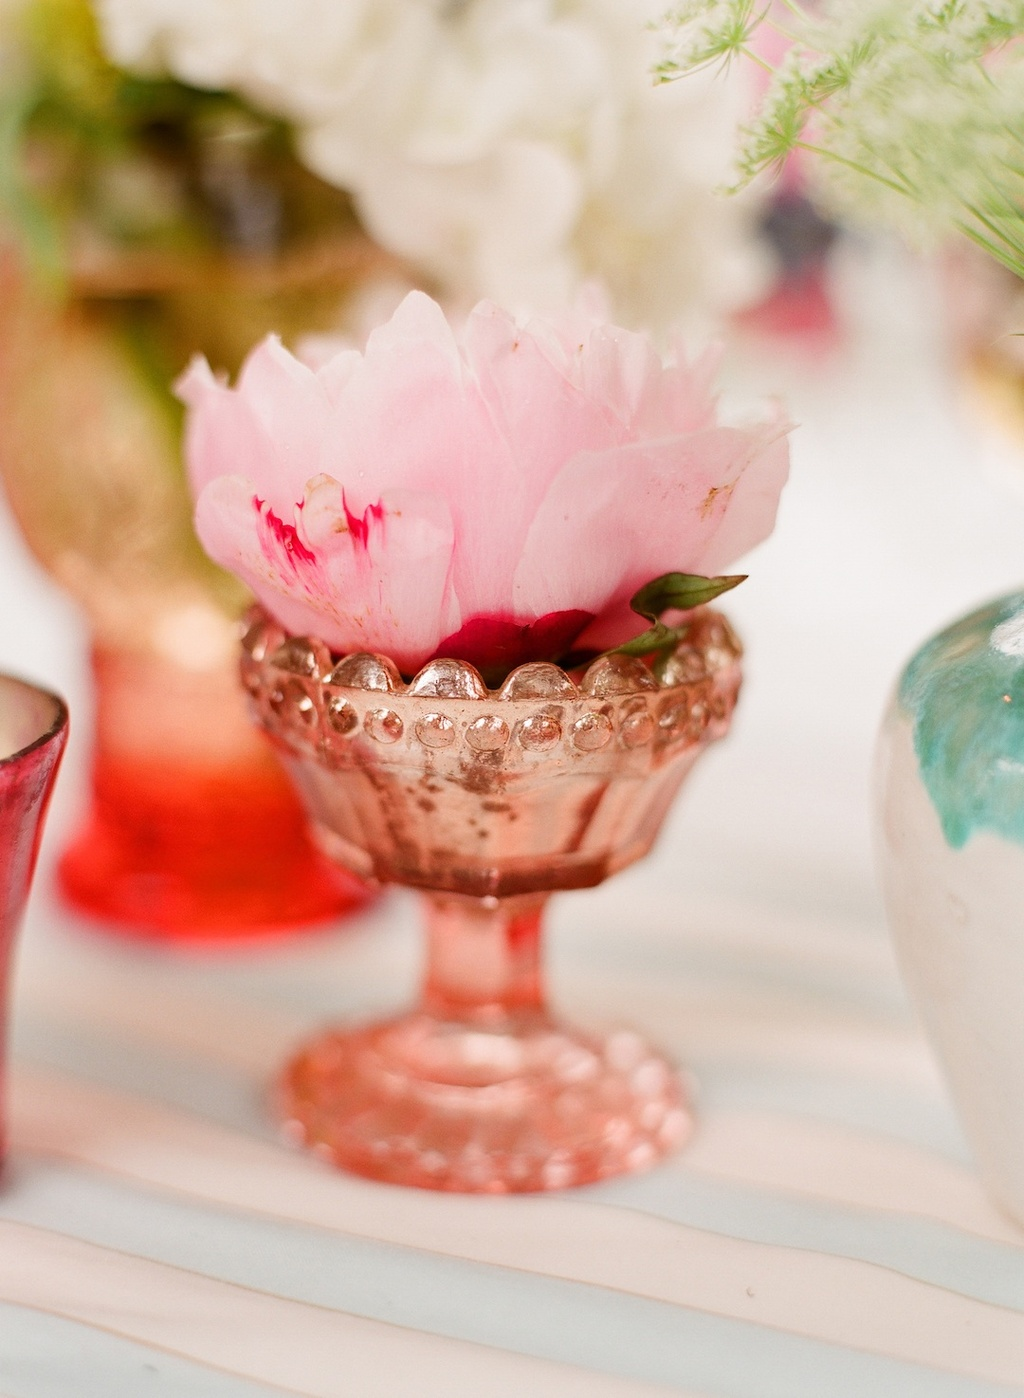 Romantic-wedding-details-outdoor-weddings-copper-vase-single-bloom-centerpiece.full